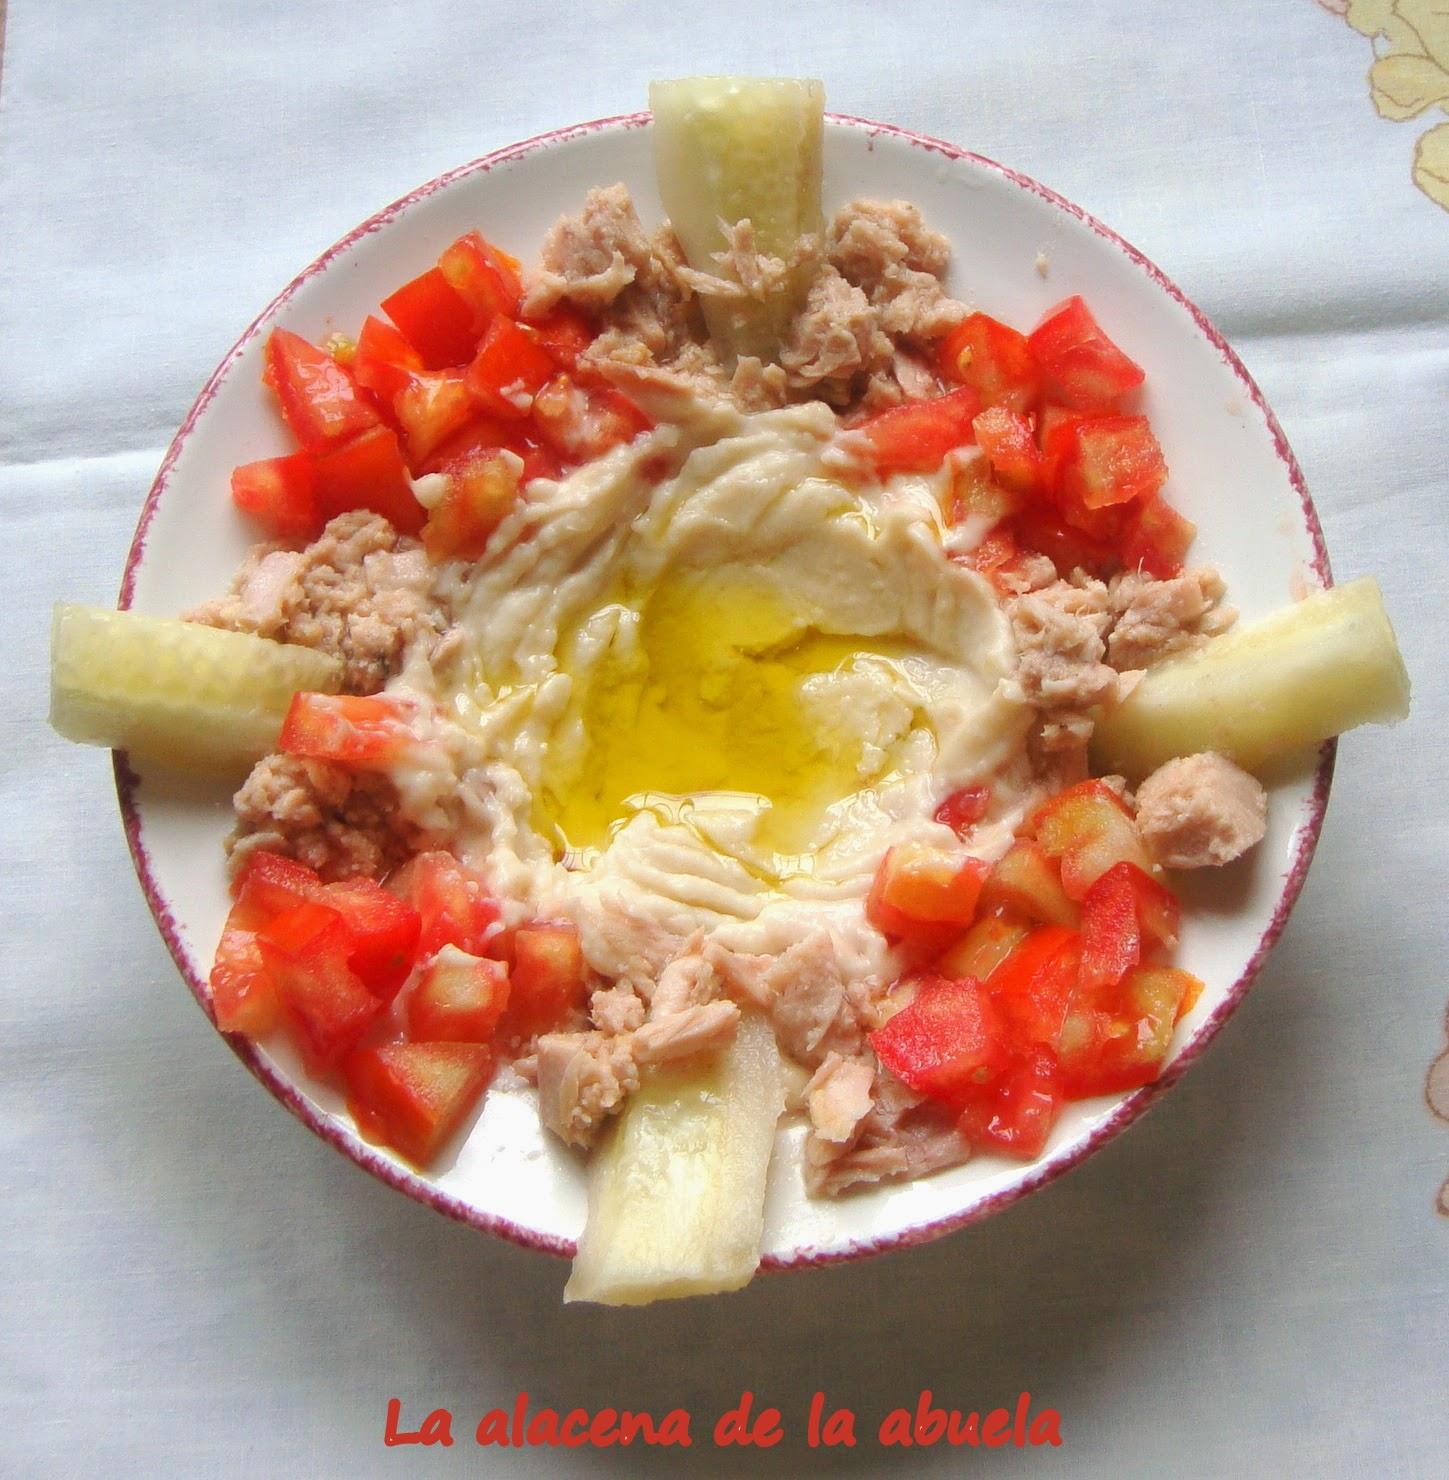 La alacena de la abuela carmen remoj n de frailes for Cocina casera de la abuela